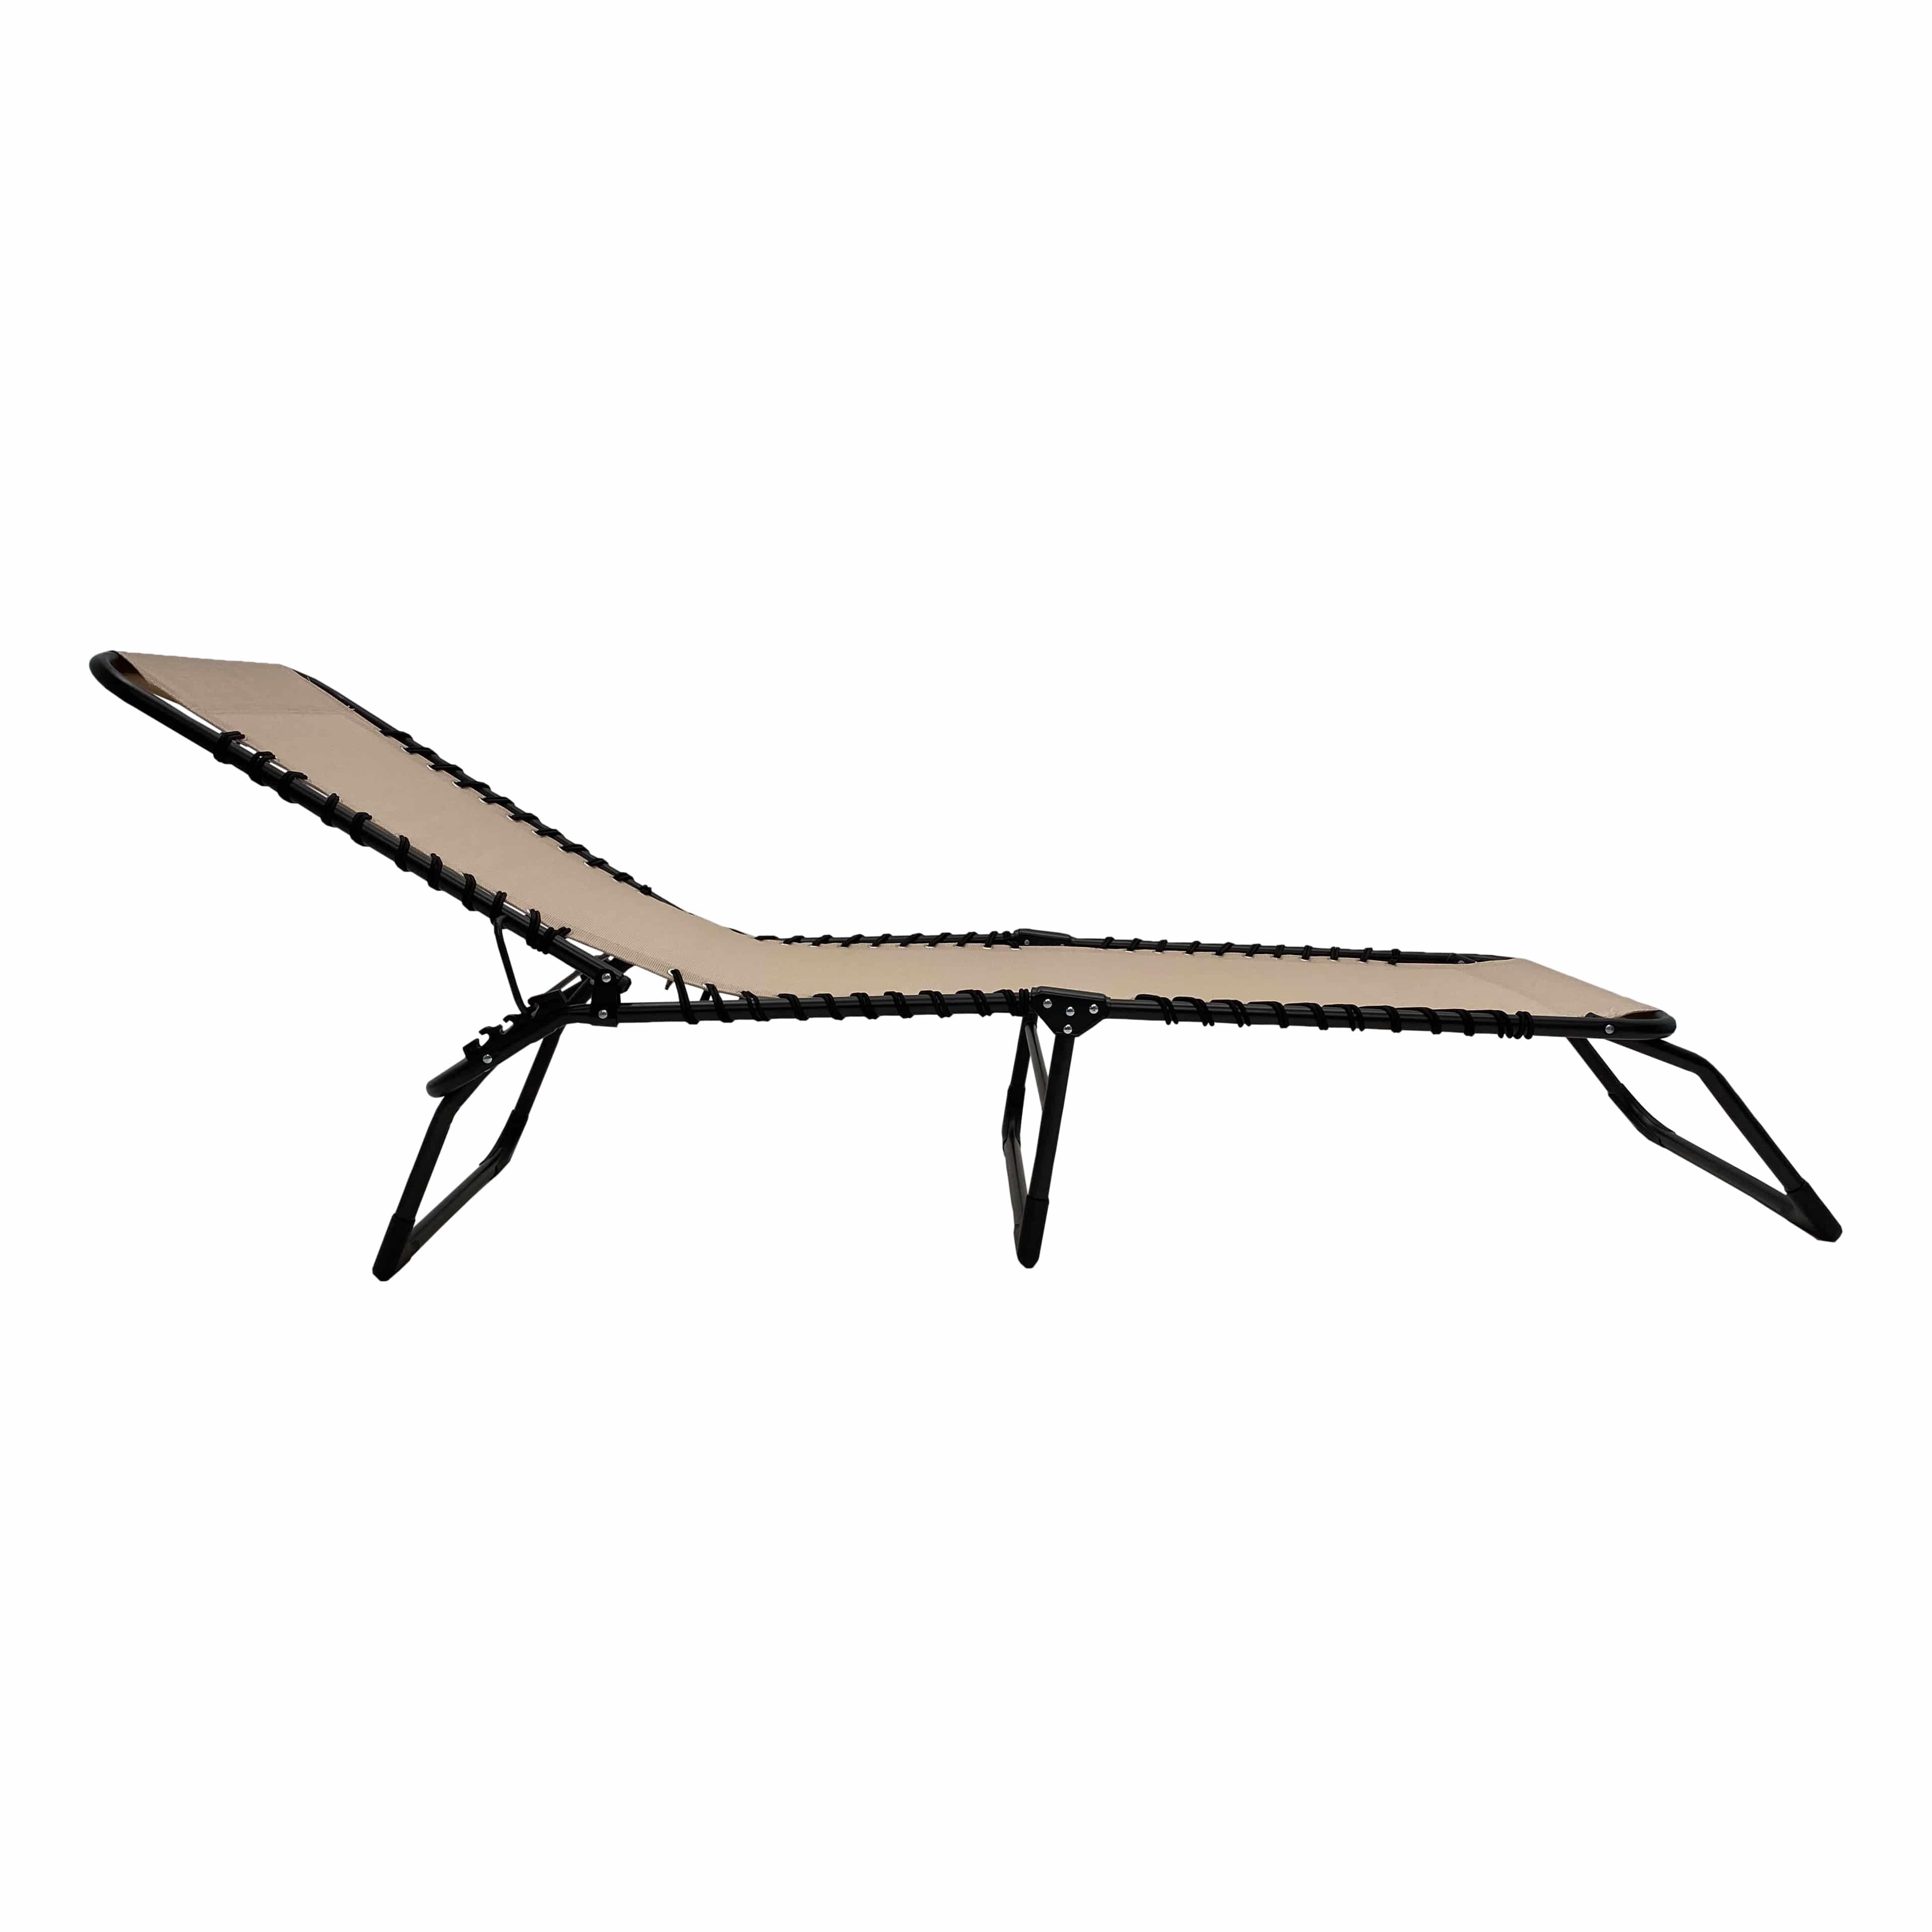 4gardenz® Comfortabel Ventilerend Opvouw Ligbed 190x57x28 cm - Creme